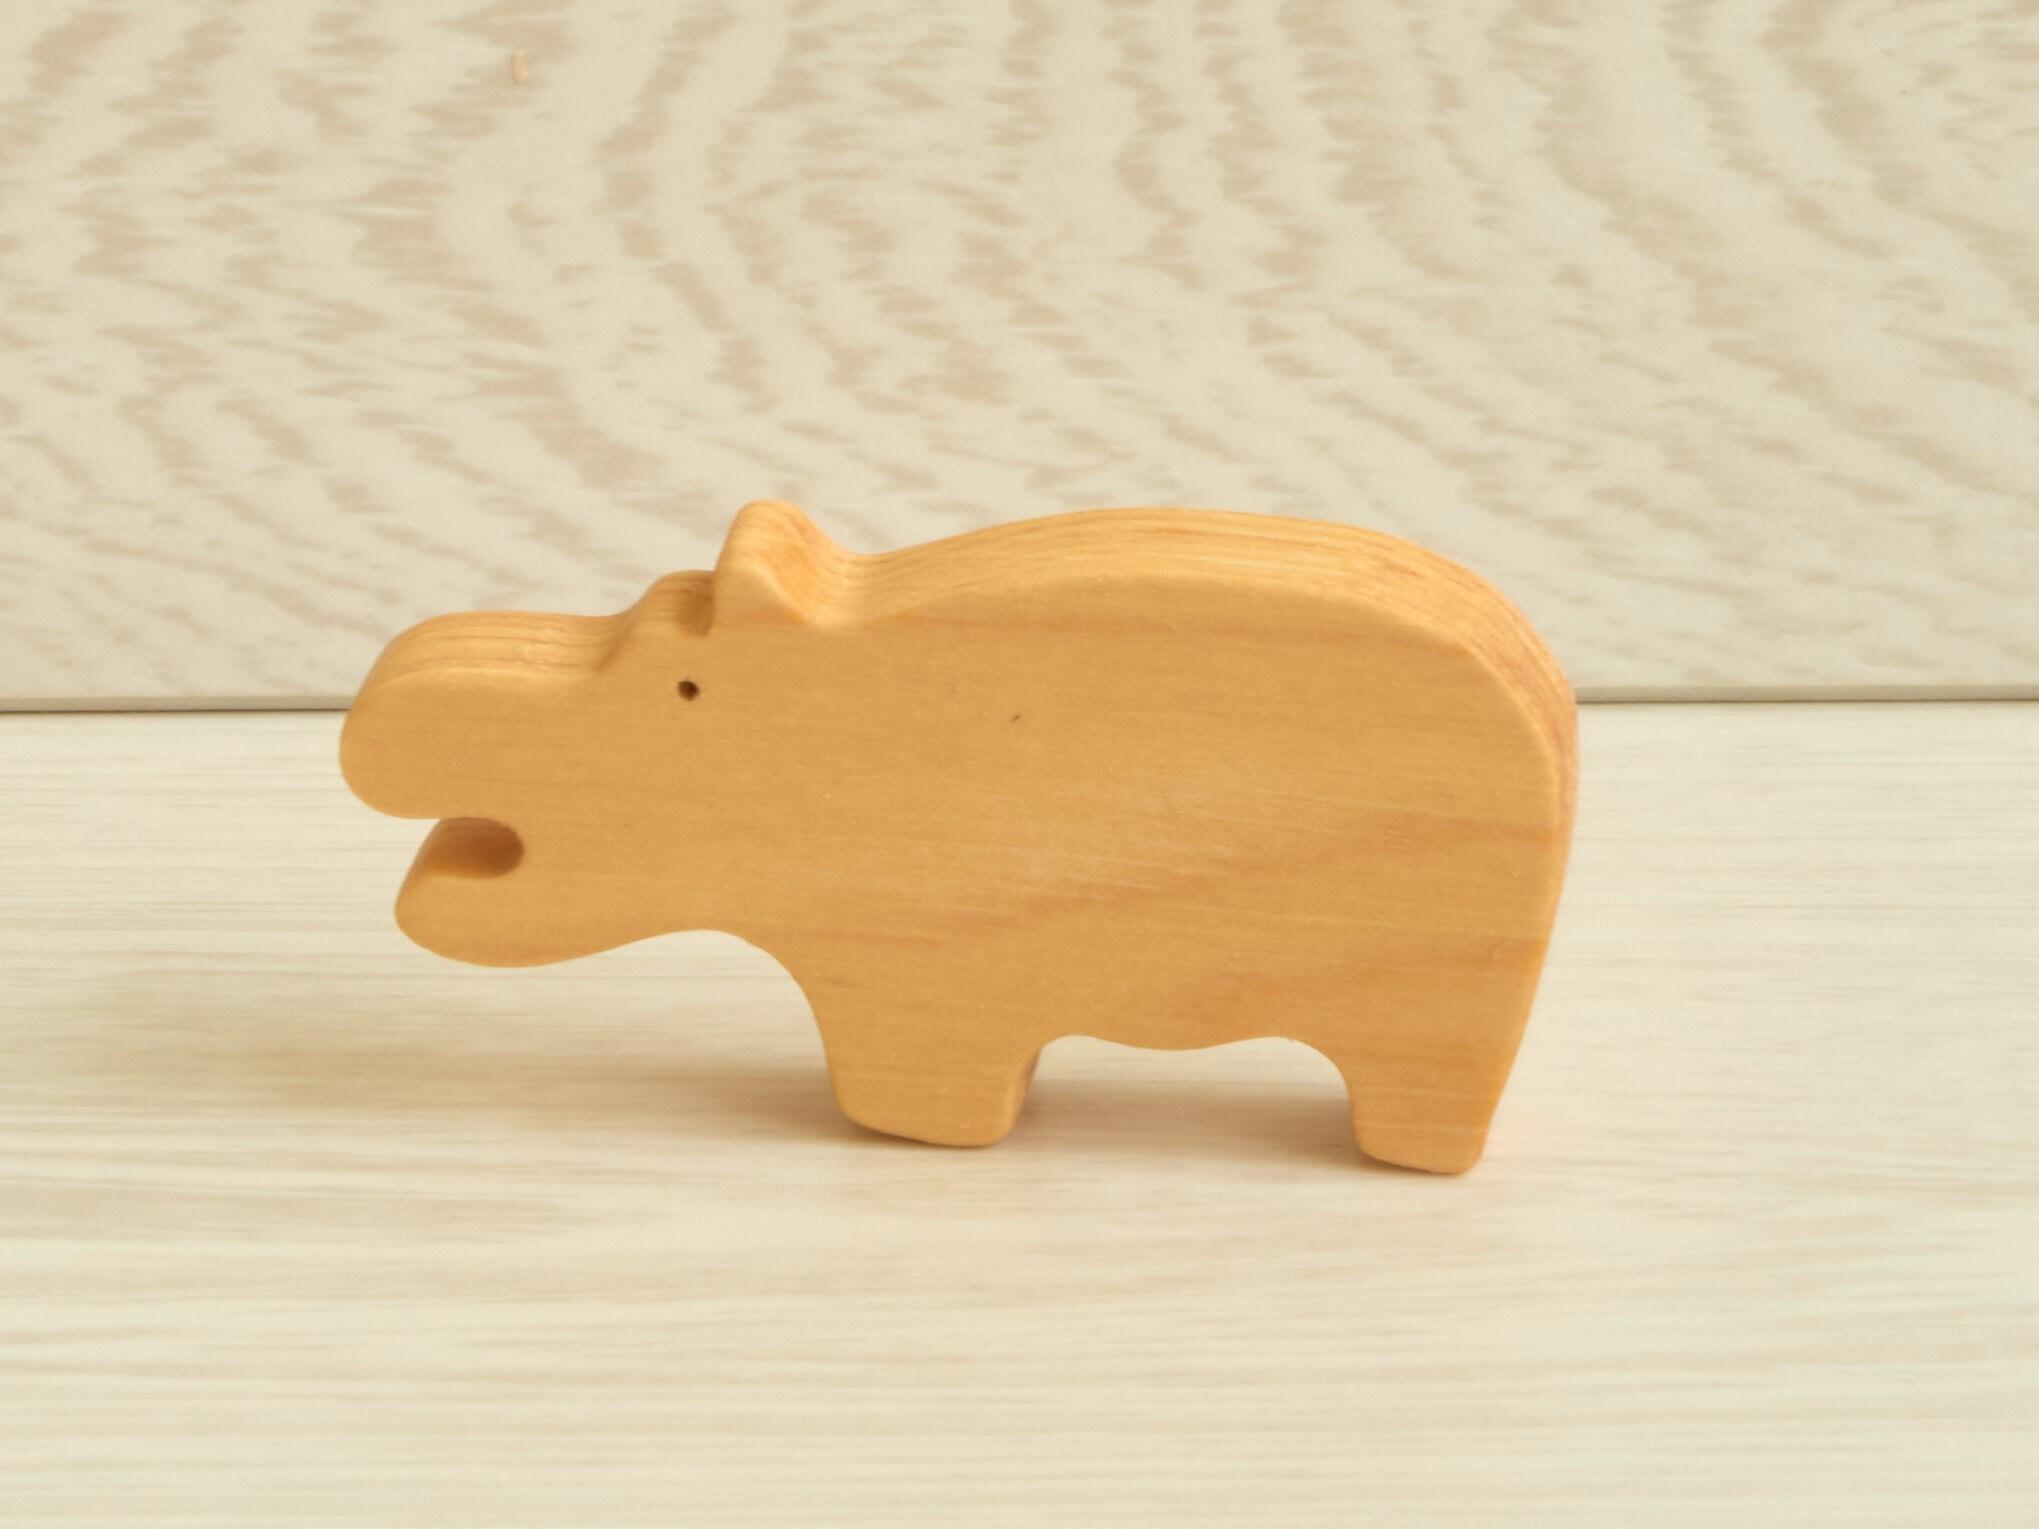 Wooden Toy Set Baby Animal Play Set Organic Wood Toys image 5